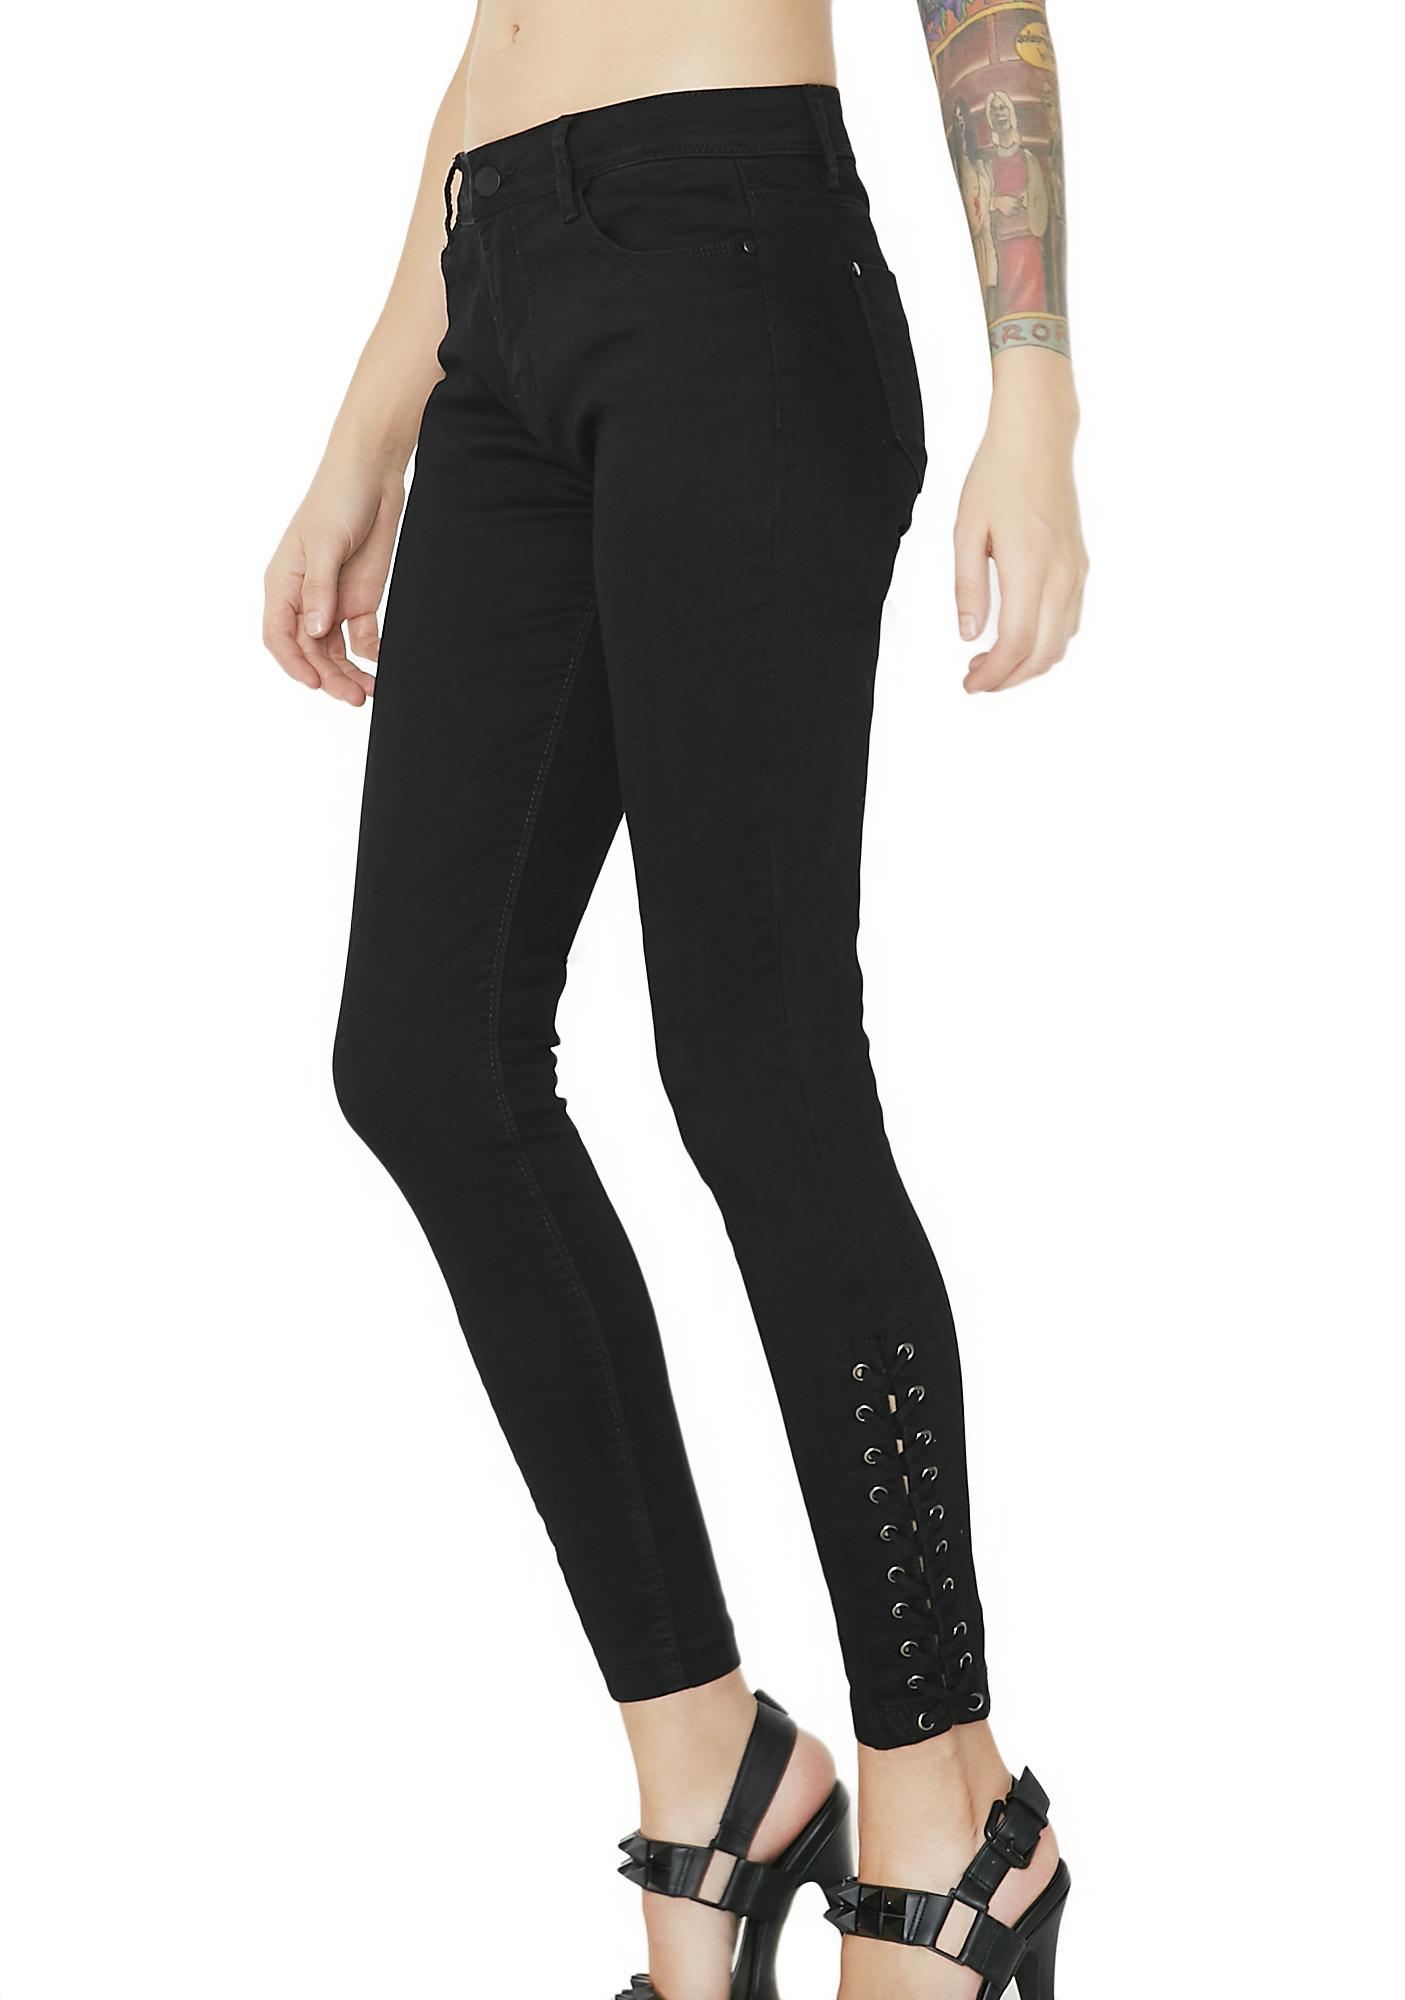 Lira Clothing Rockaway Denim Jeans